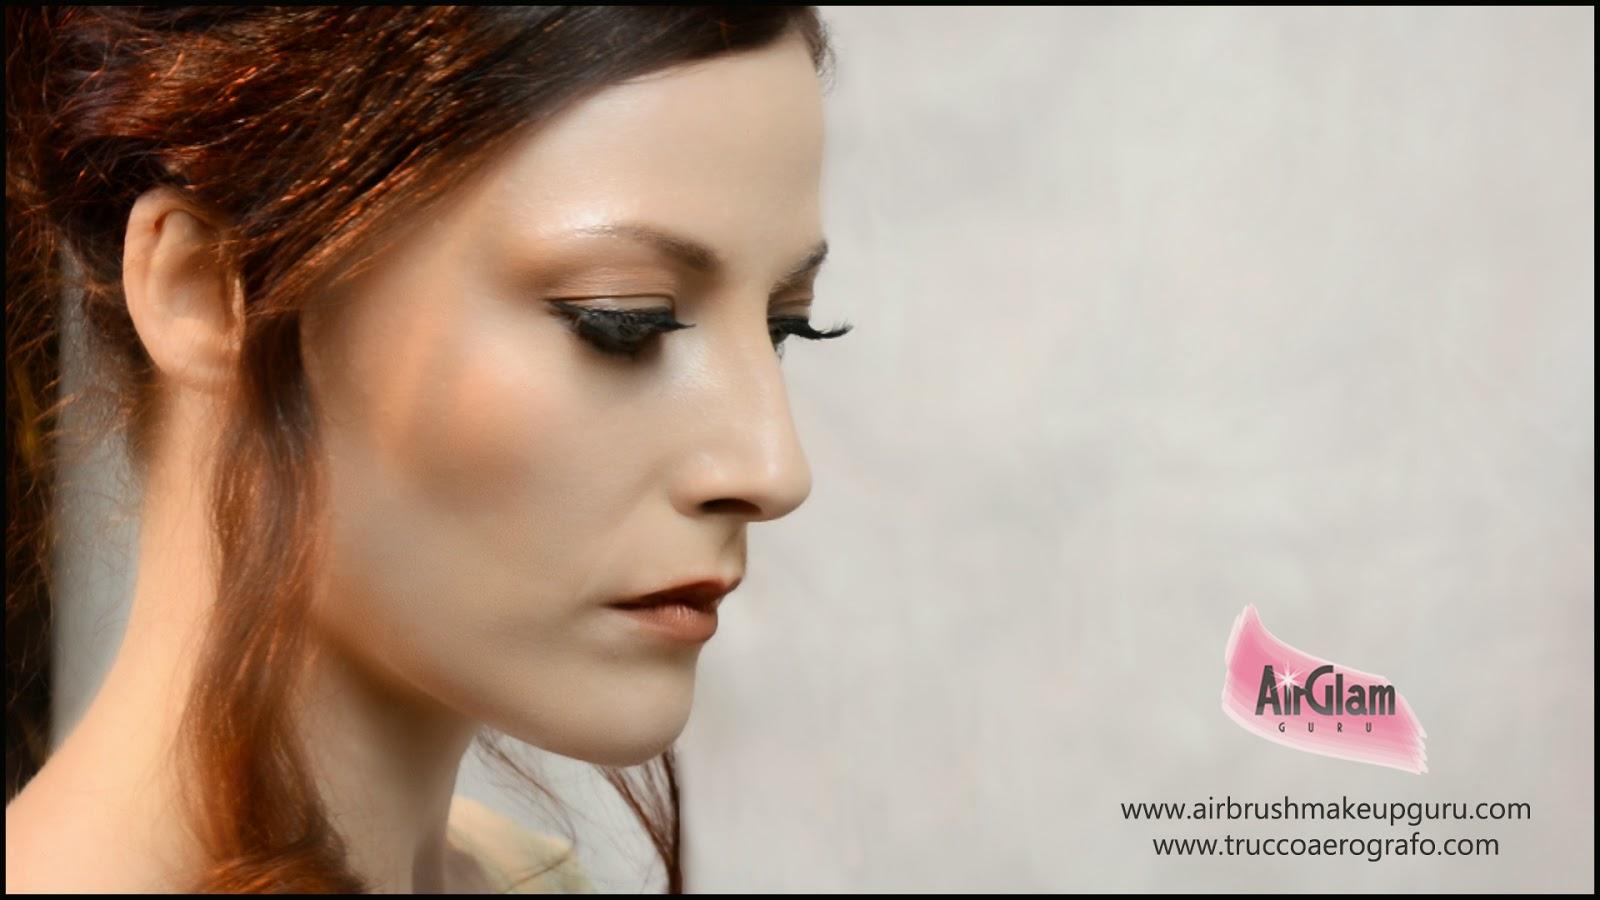 belloccio airbrush makeup reviews